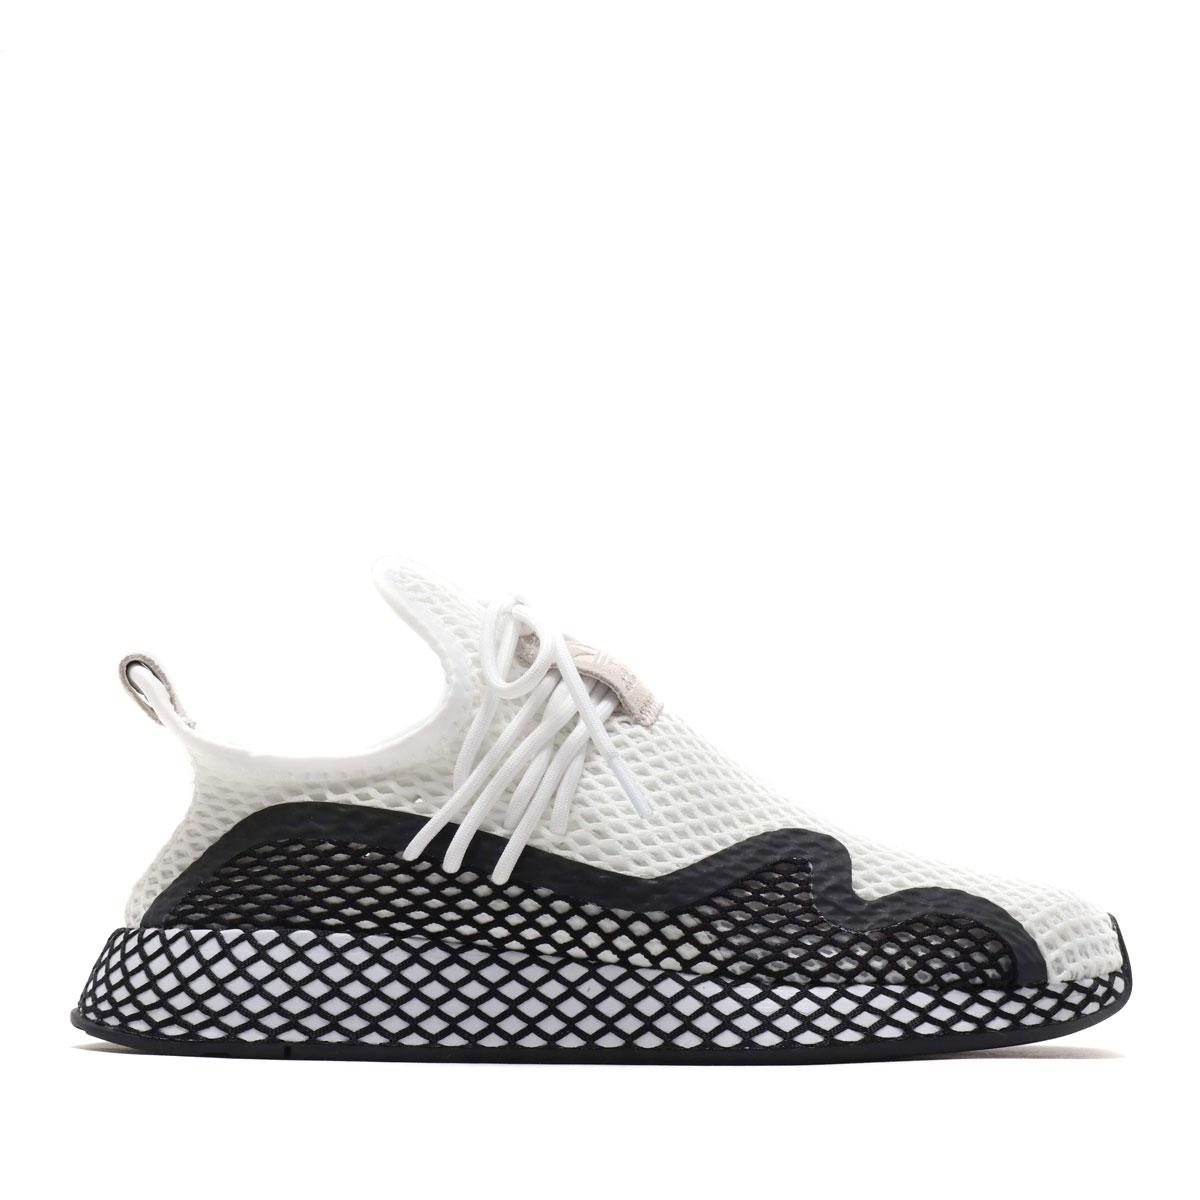 adidas Originals DEERUPT NEW RUNNER(RUNNING WHITE/CORE BLACK/RUNNING WHITE)(アディダスオリジナルス ディーラプト ニュー ランナー)【メンズ】【スニーカー】【19SS-I】